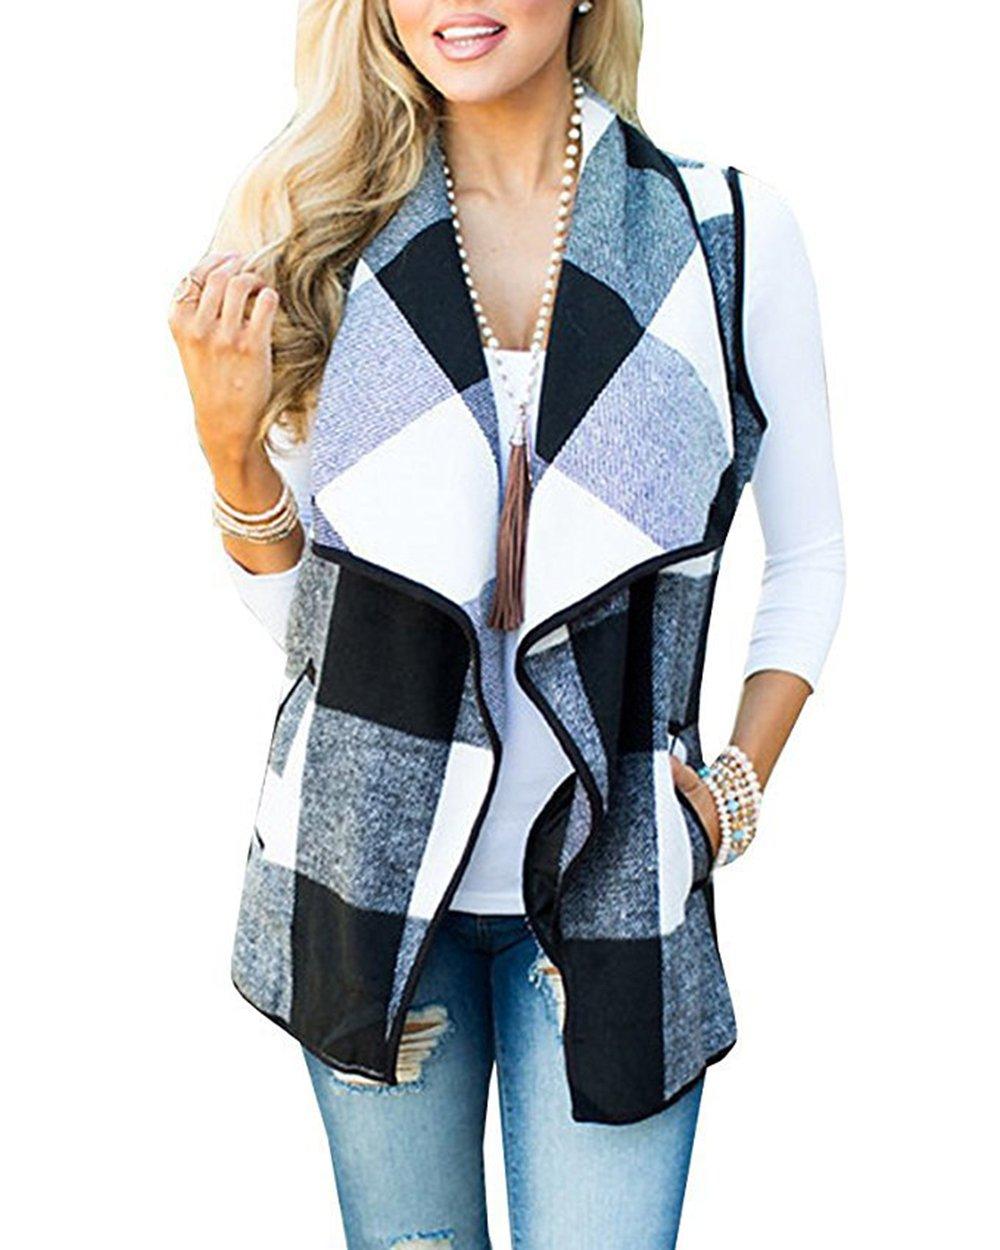 Lovelyduo Women's Open Front Sleeveless Vest Cardigan Coat Black S